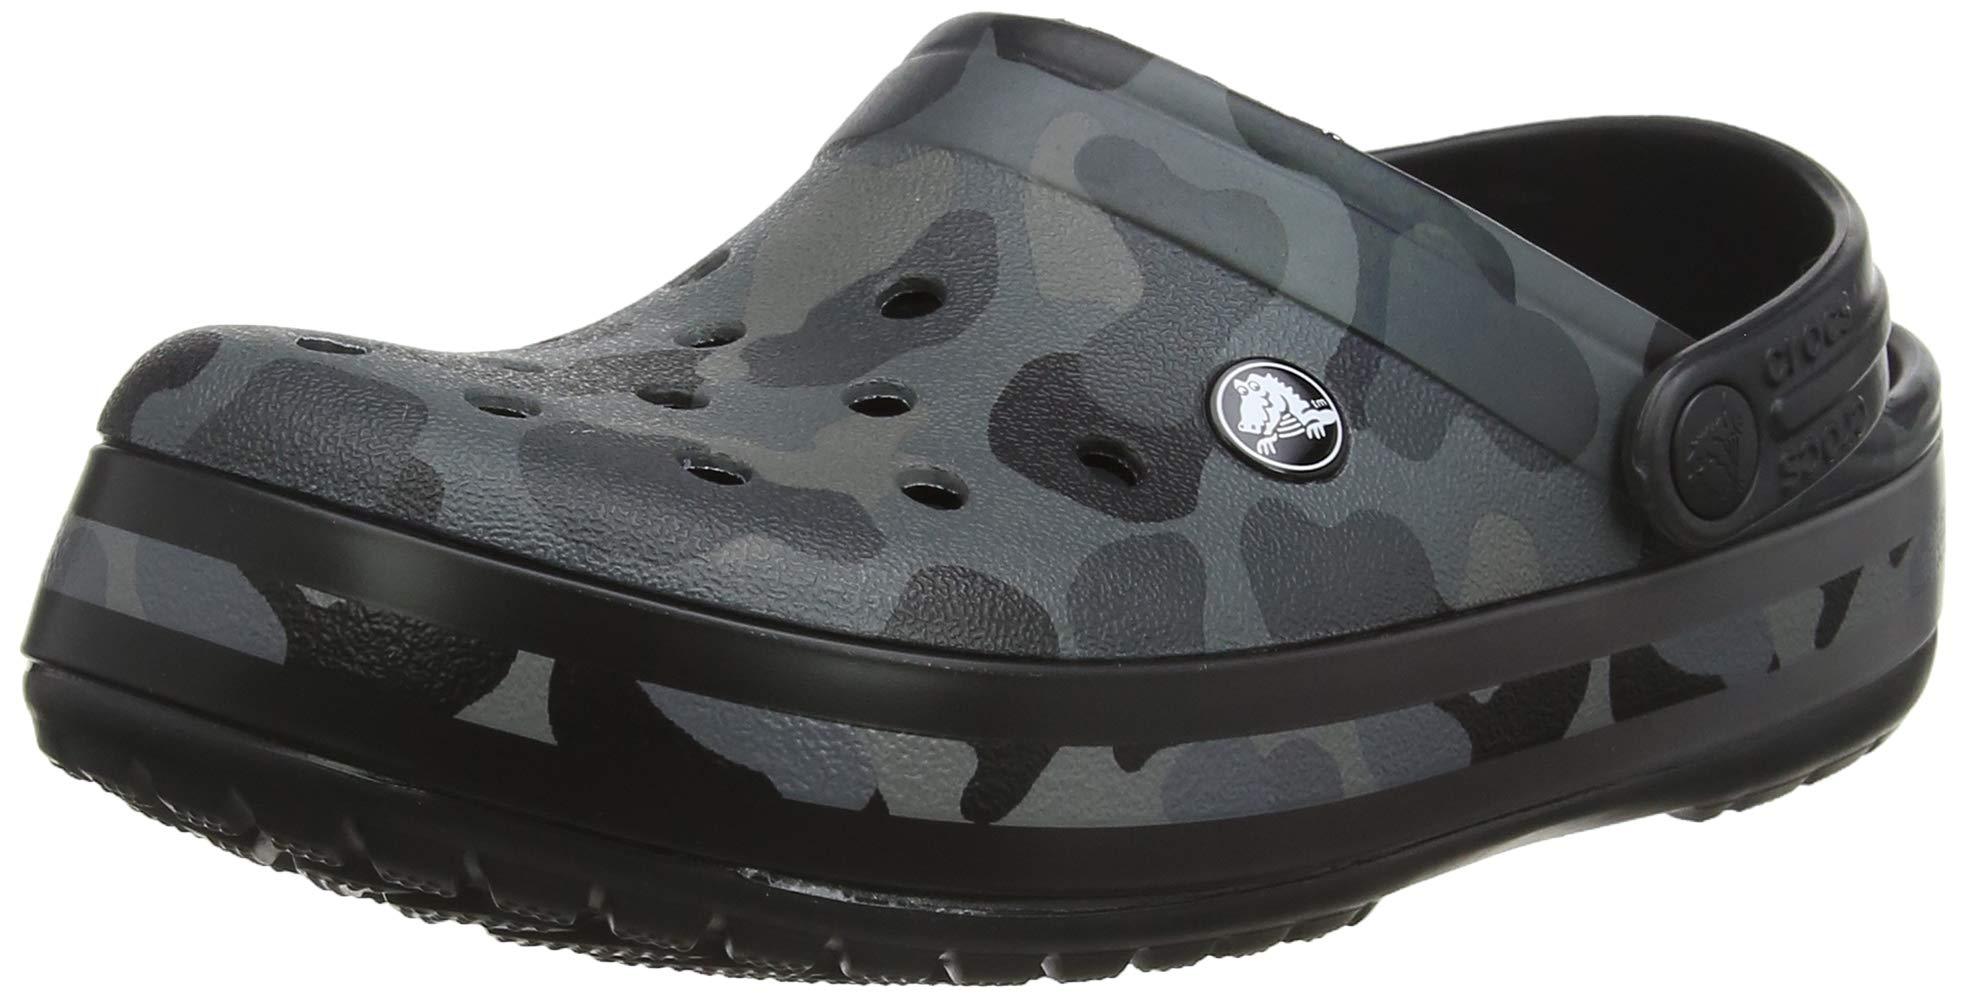 Crocband Seasonal ClogSabots AdulteGrisslate 0dy42 Mixte black Crocs 43 Eu Graphic Grey 7bYgf6y